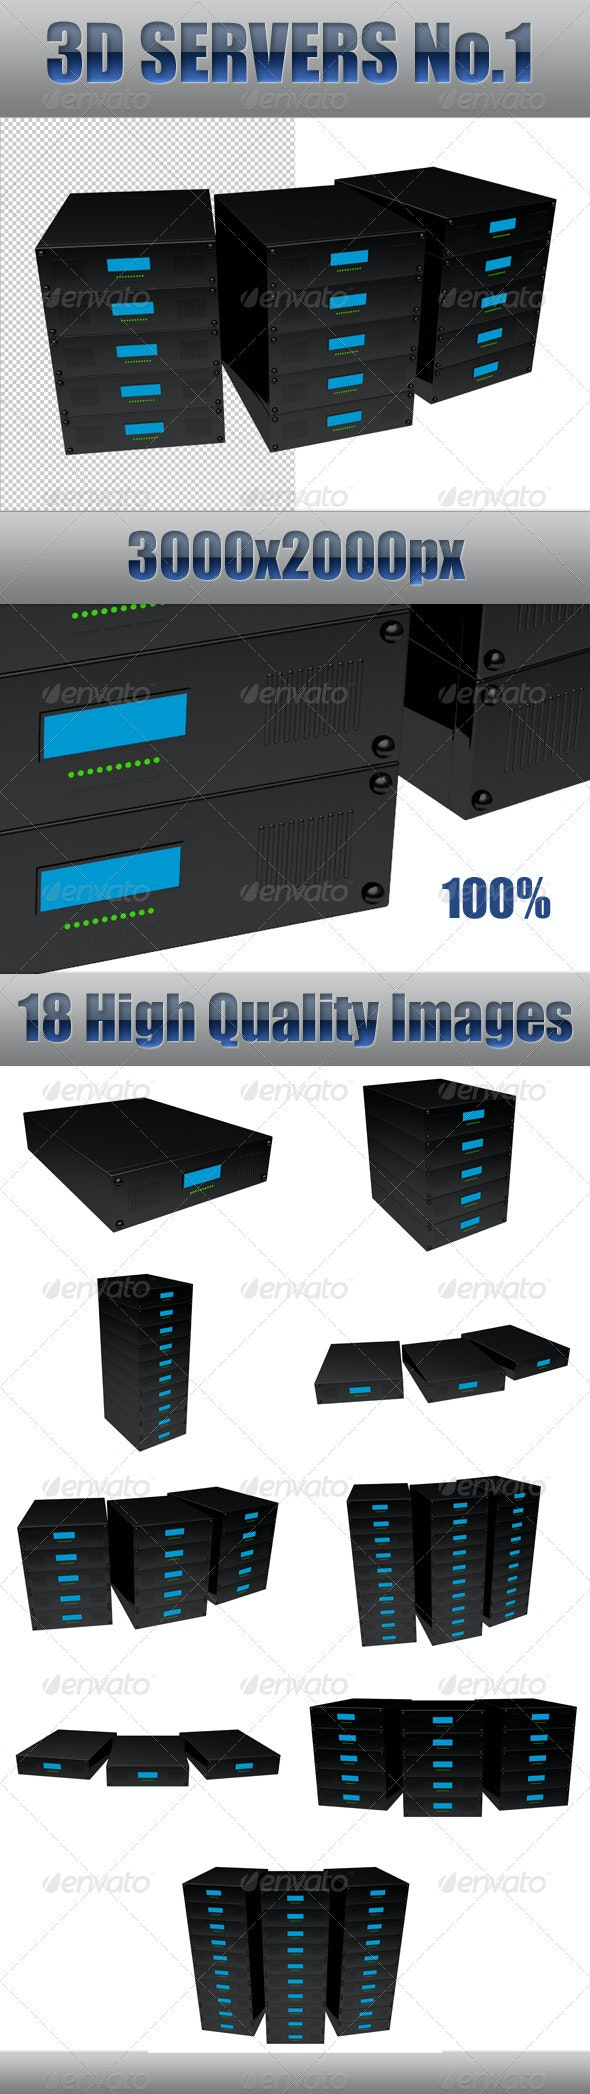 3D Servers No. 1 - 3D Renders Graphics